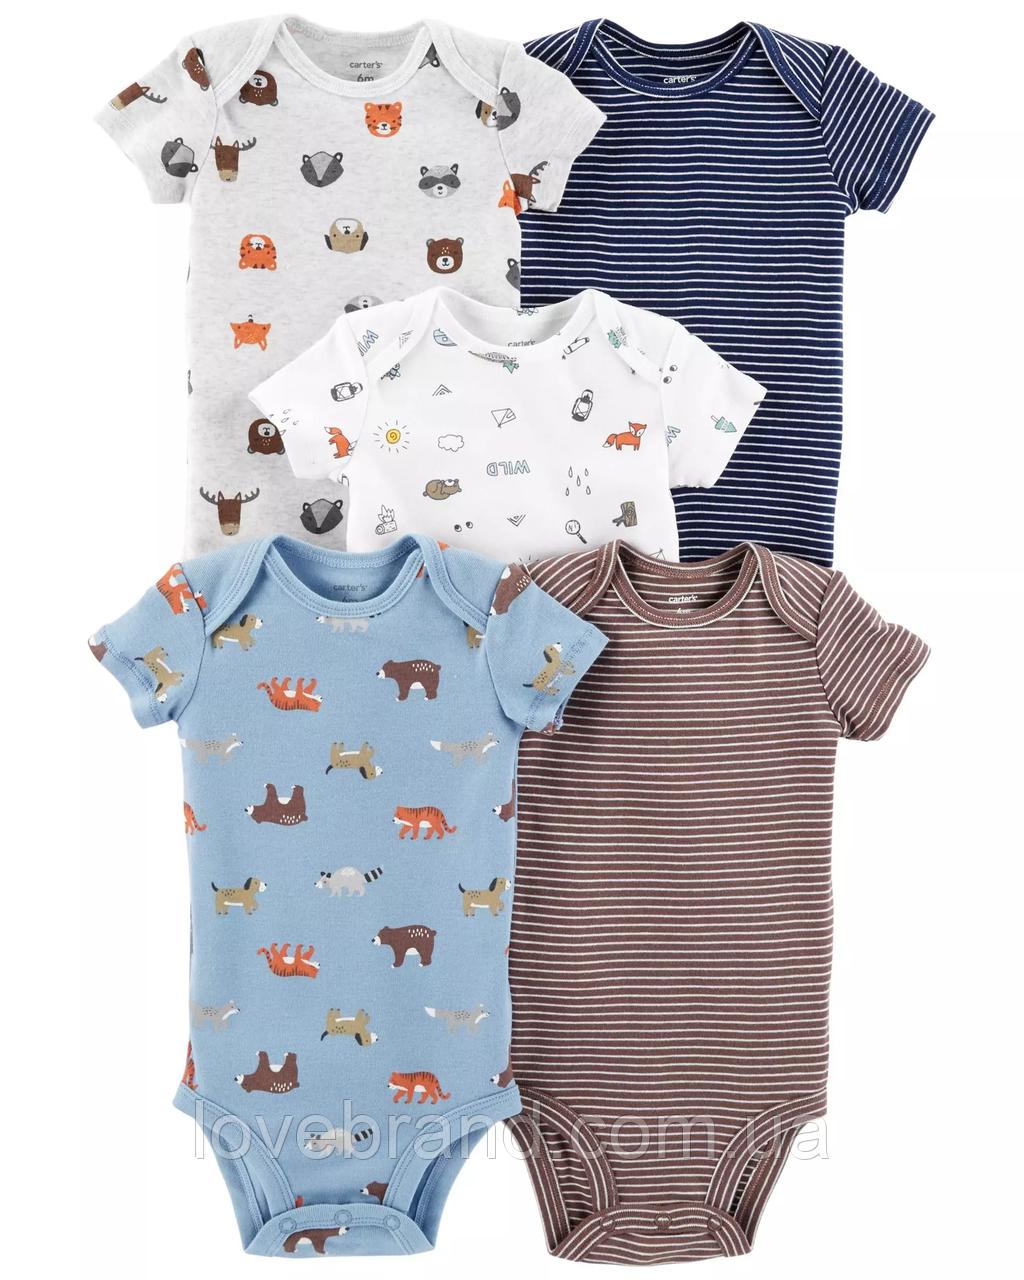 "Набор боди футболка на короткий рукав 5 шт""Зверушки"" Carter's 9 мес/67-72 см бодики маечка для малыша картерс"